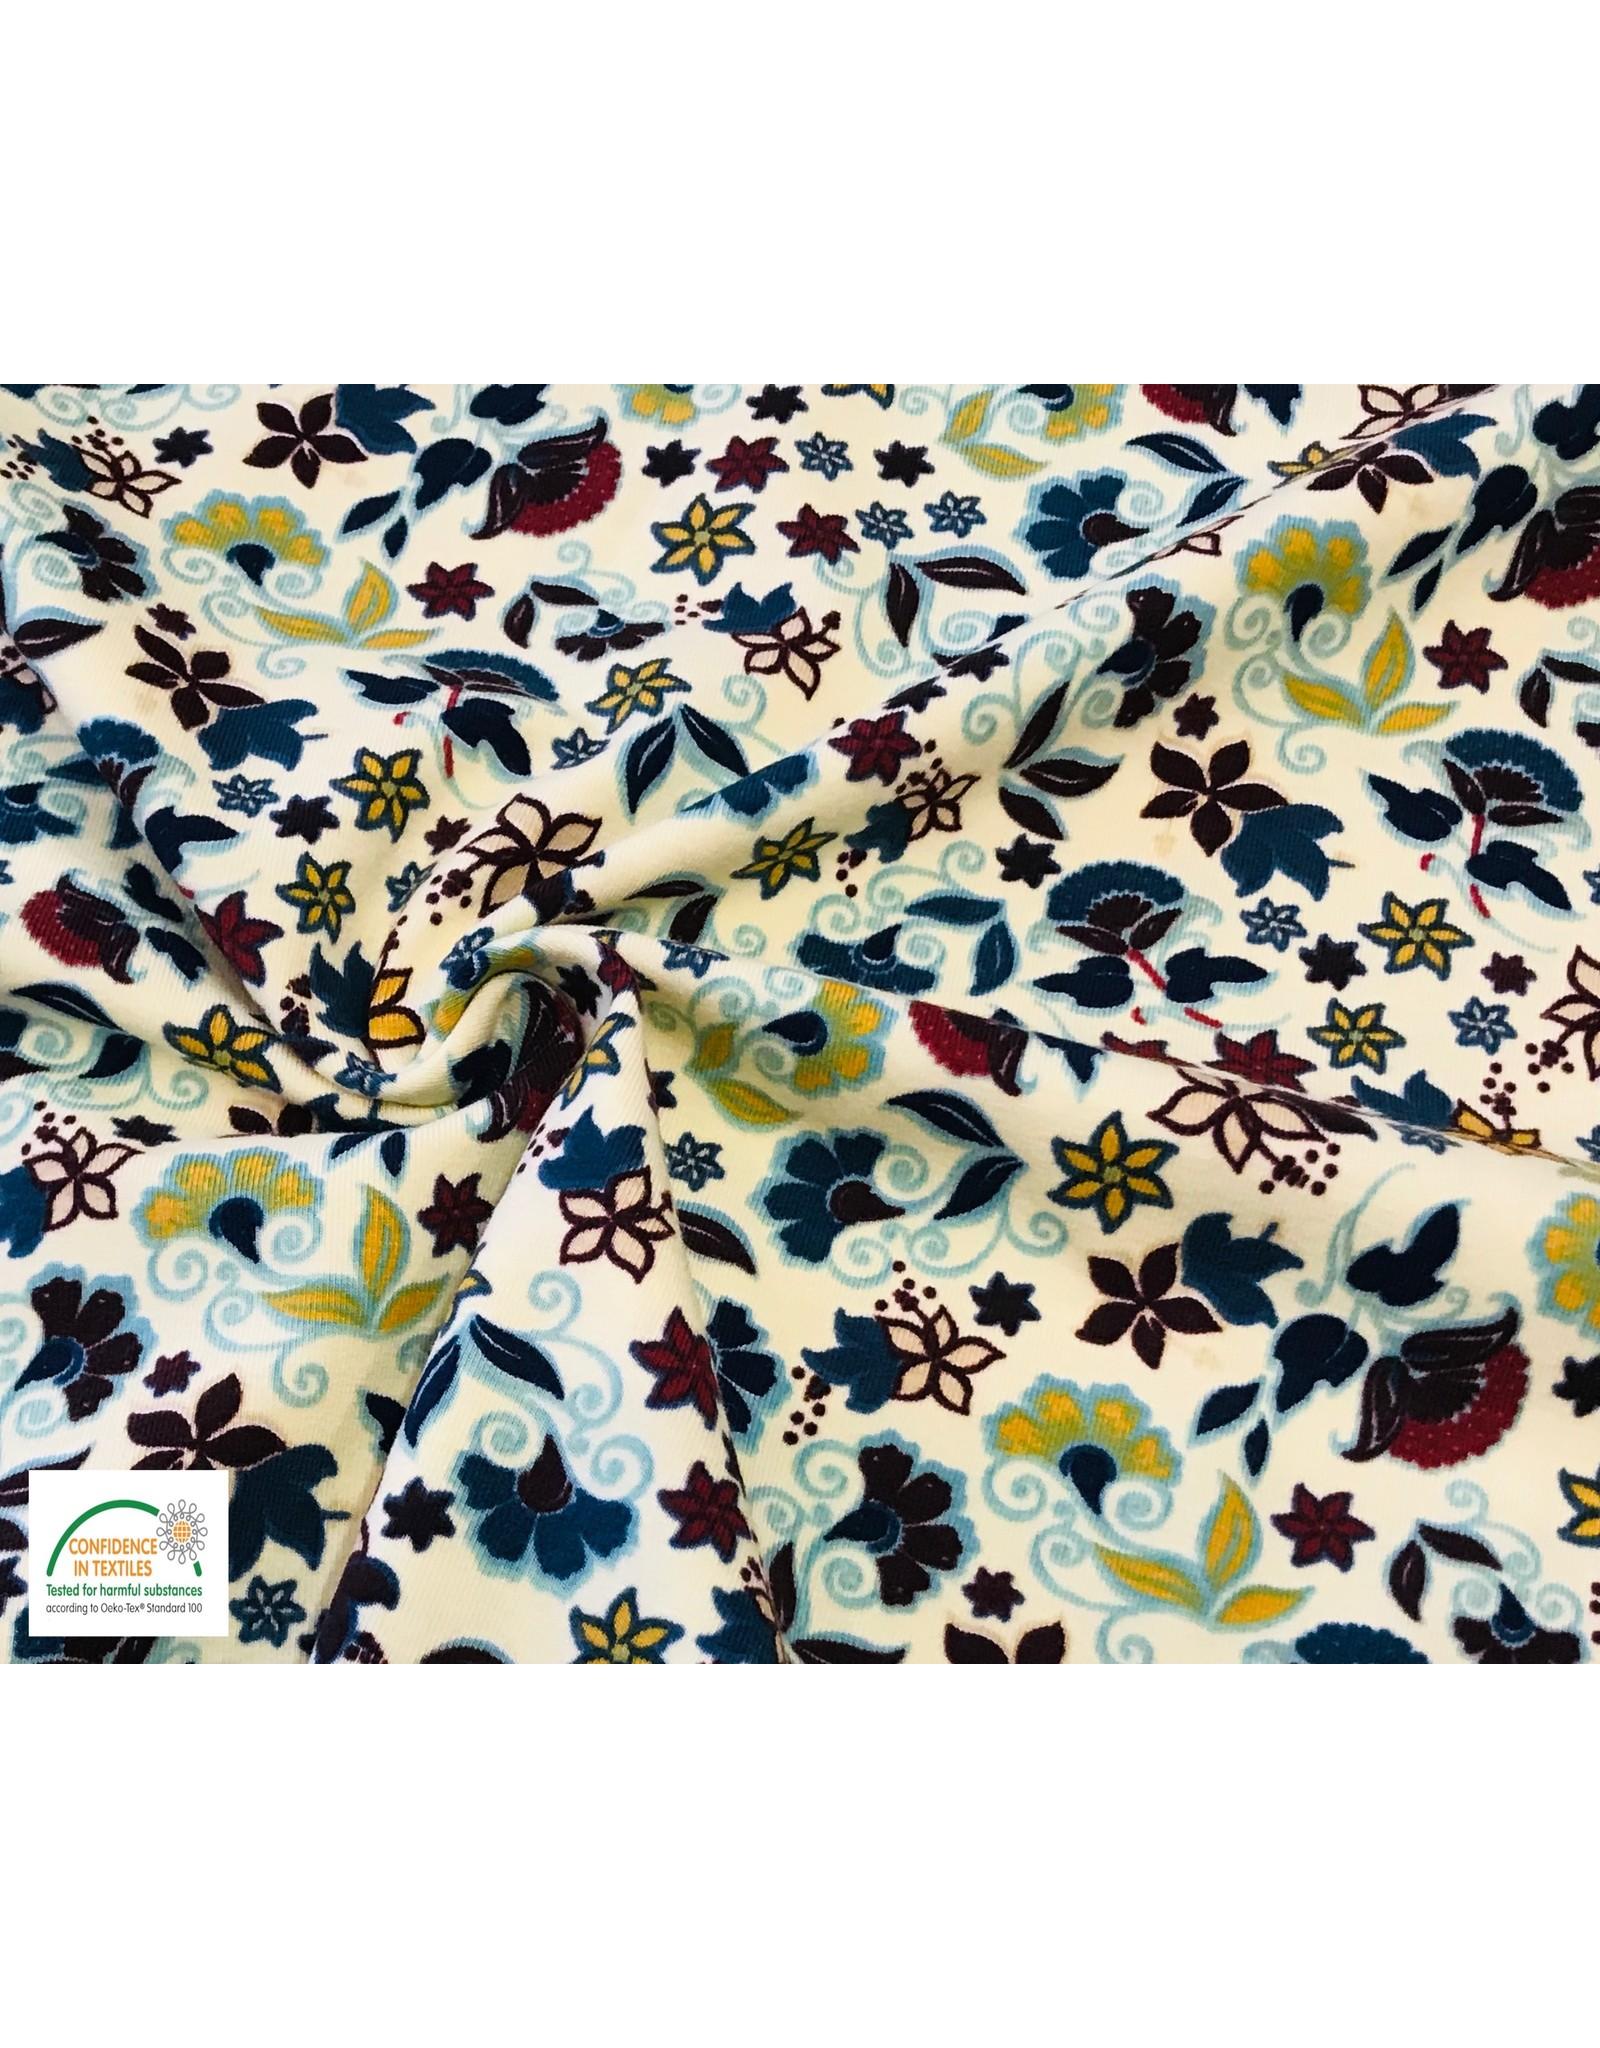 Megan Blue Fabrics Cotton jersey print ecru